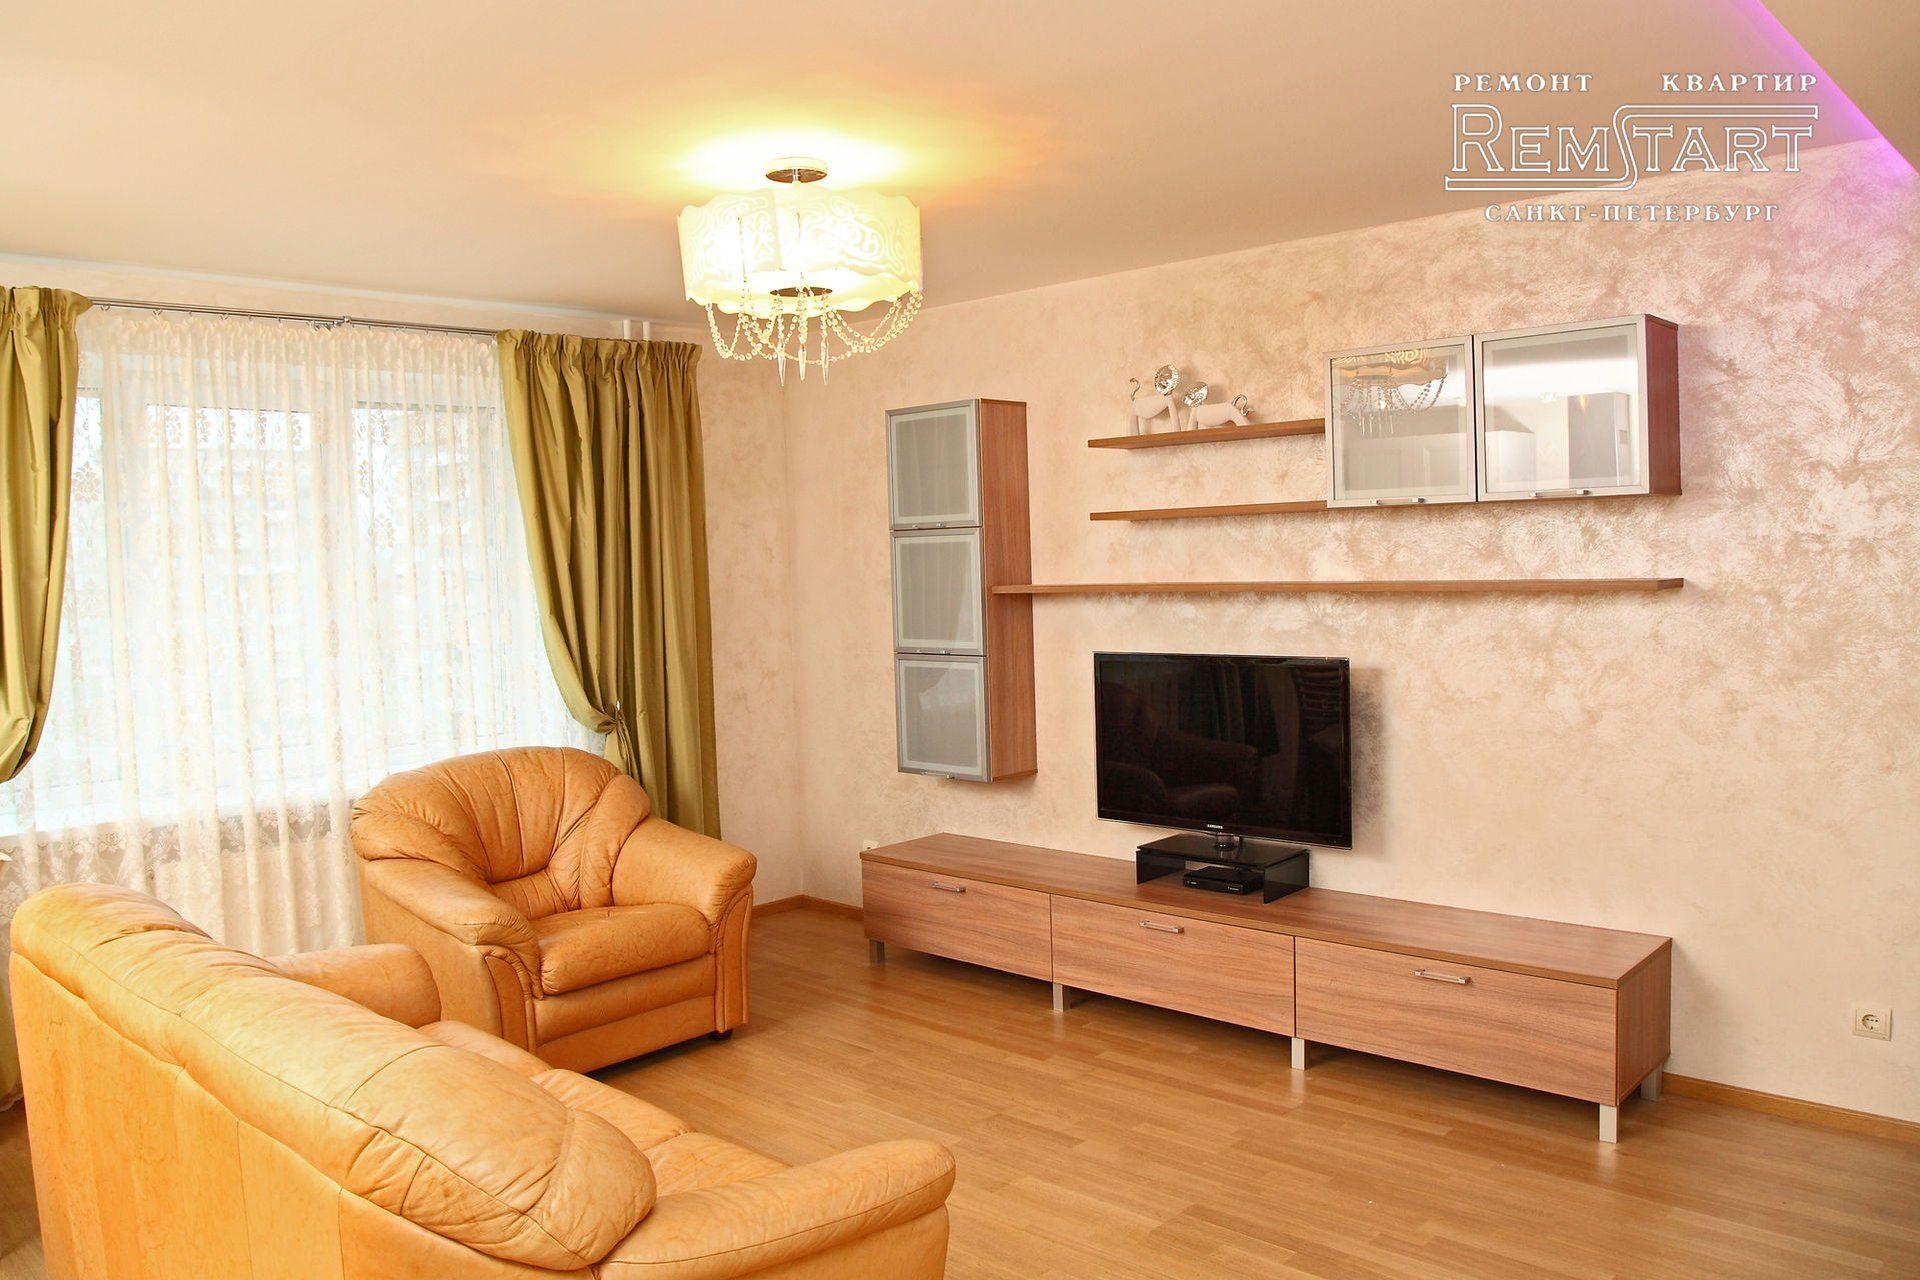 Сколько стоит ремонт квартиры 45 кв м в Казани: цена на